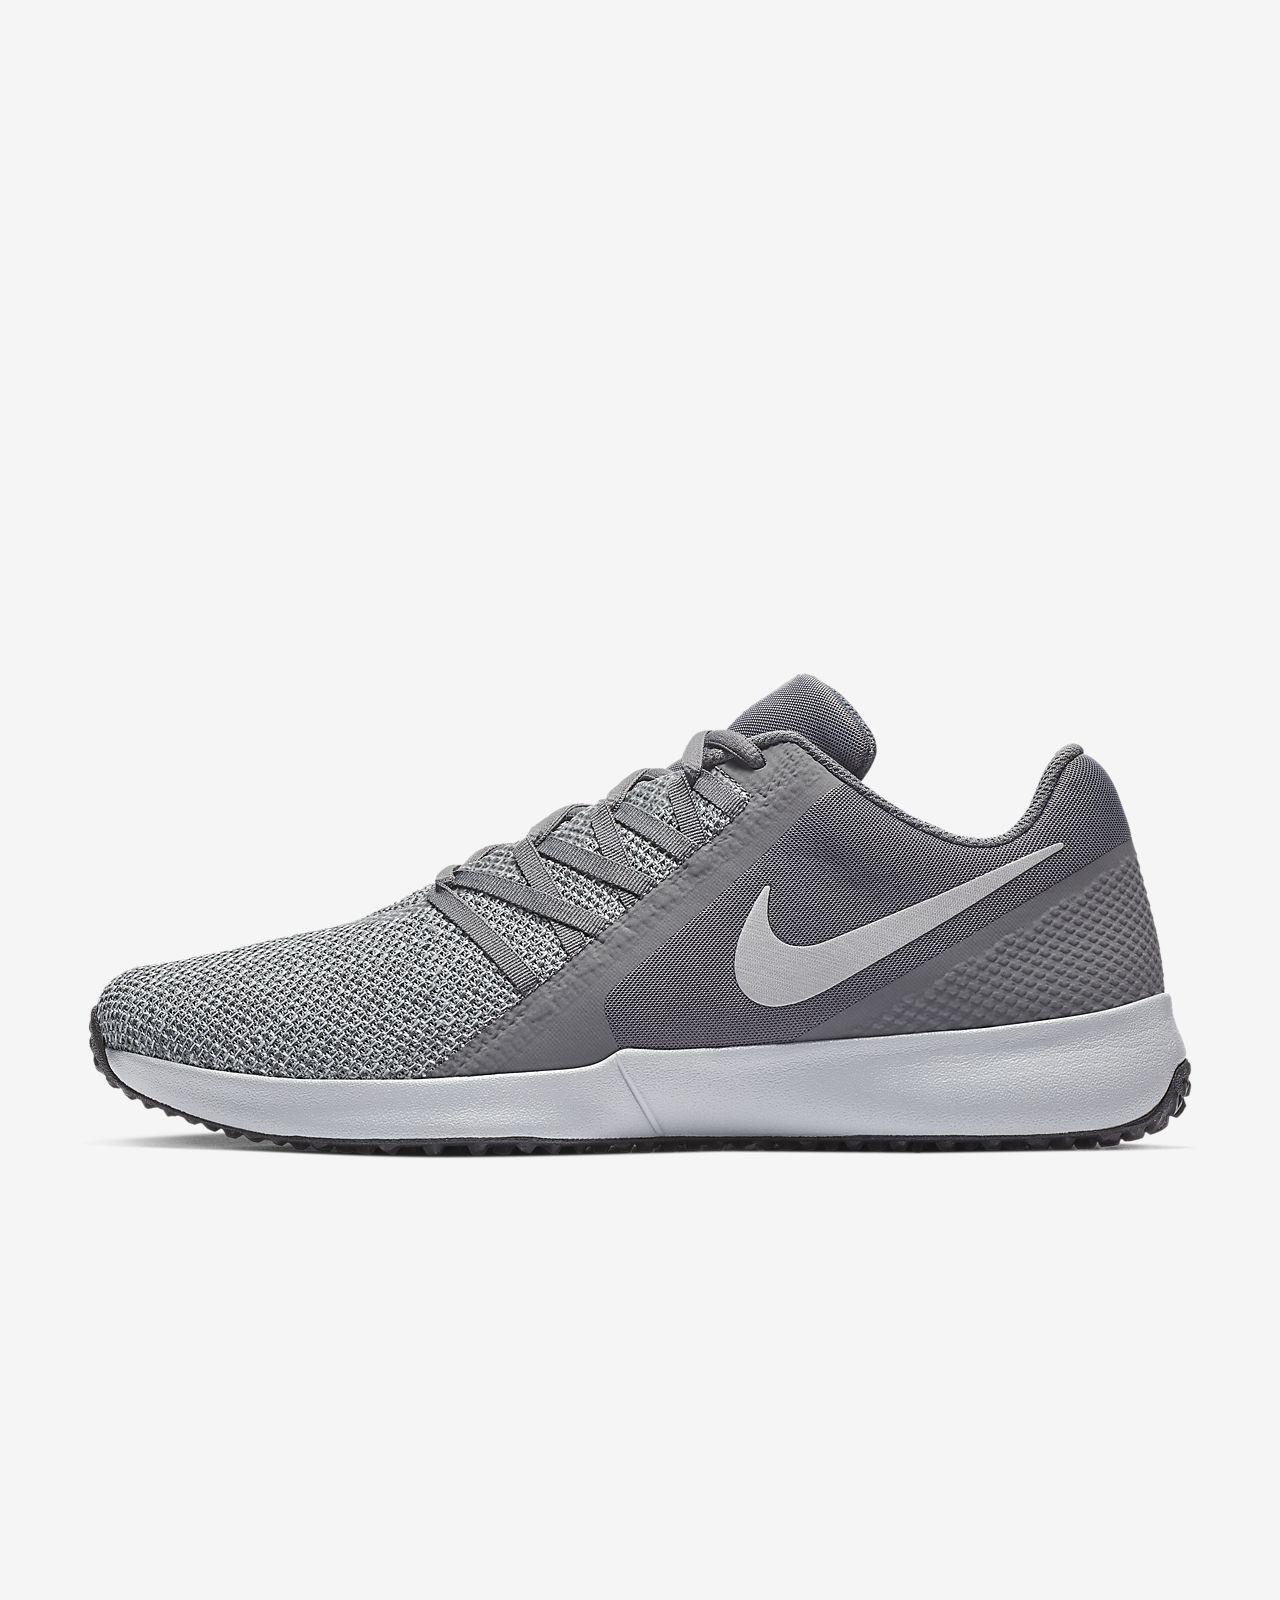 Et Nike Complete Fitness Sportif Varsity De Chaussure Training S7BaqH